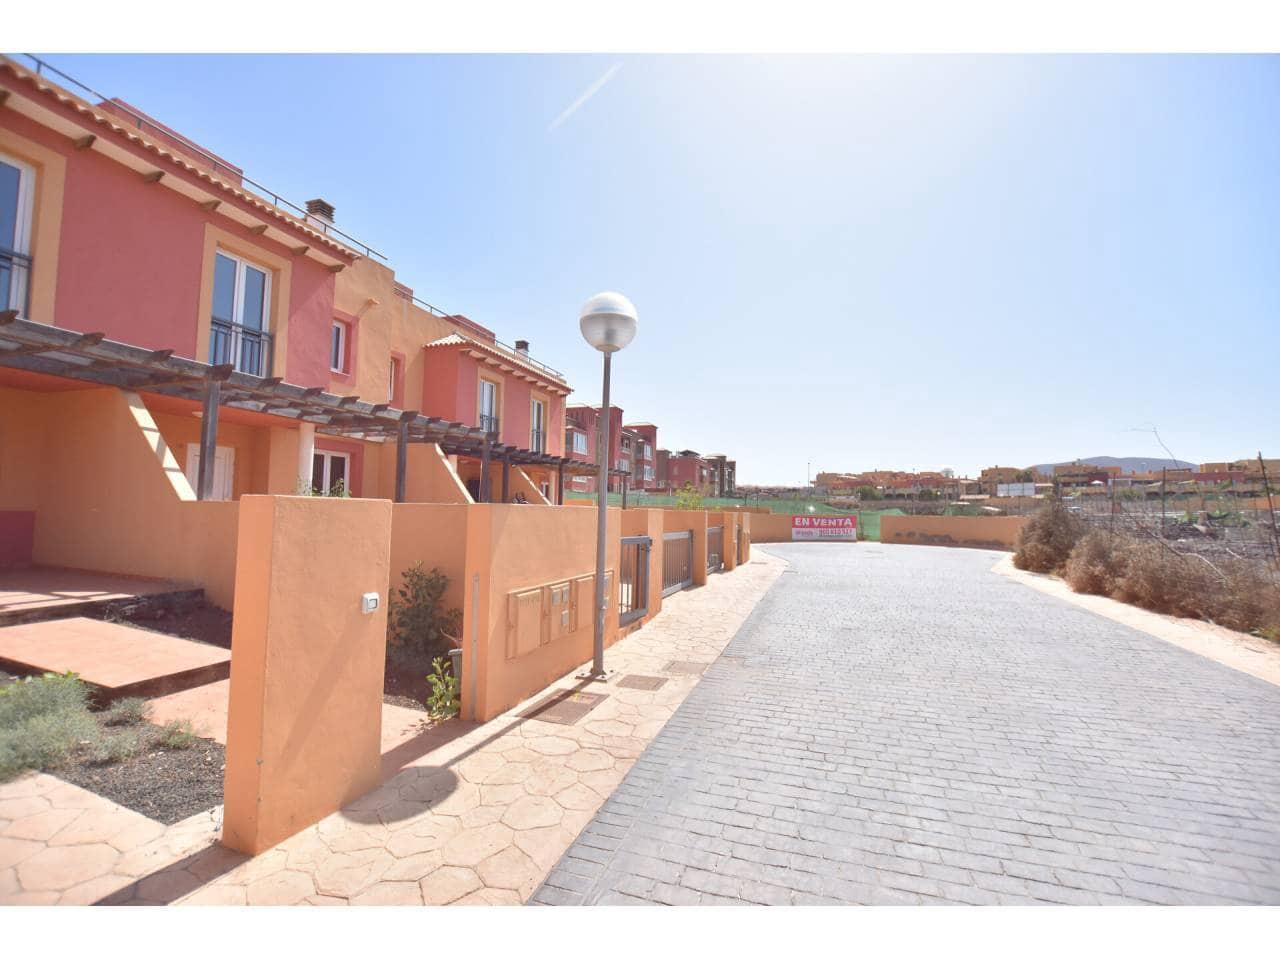 3 soveværelse Byhus til salg i Corralejo - € 150.000 (Ref: 6240541)